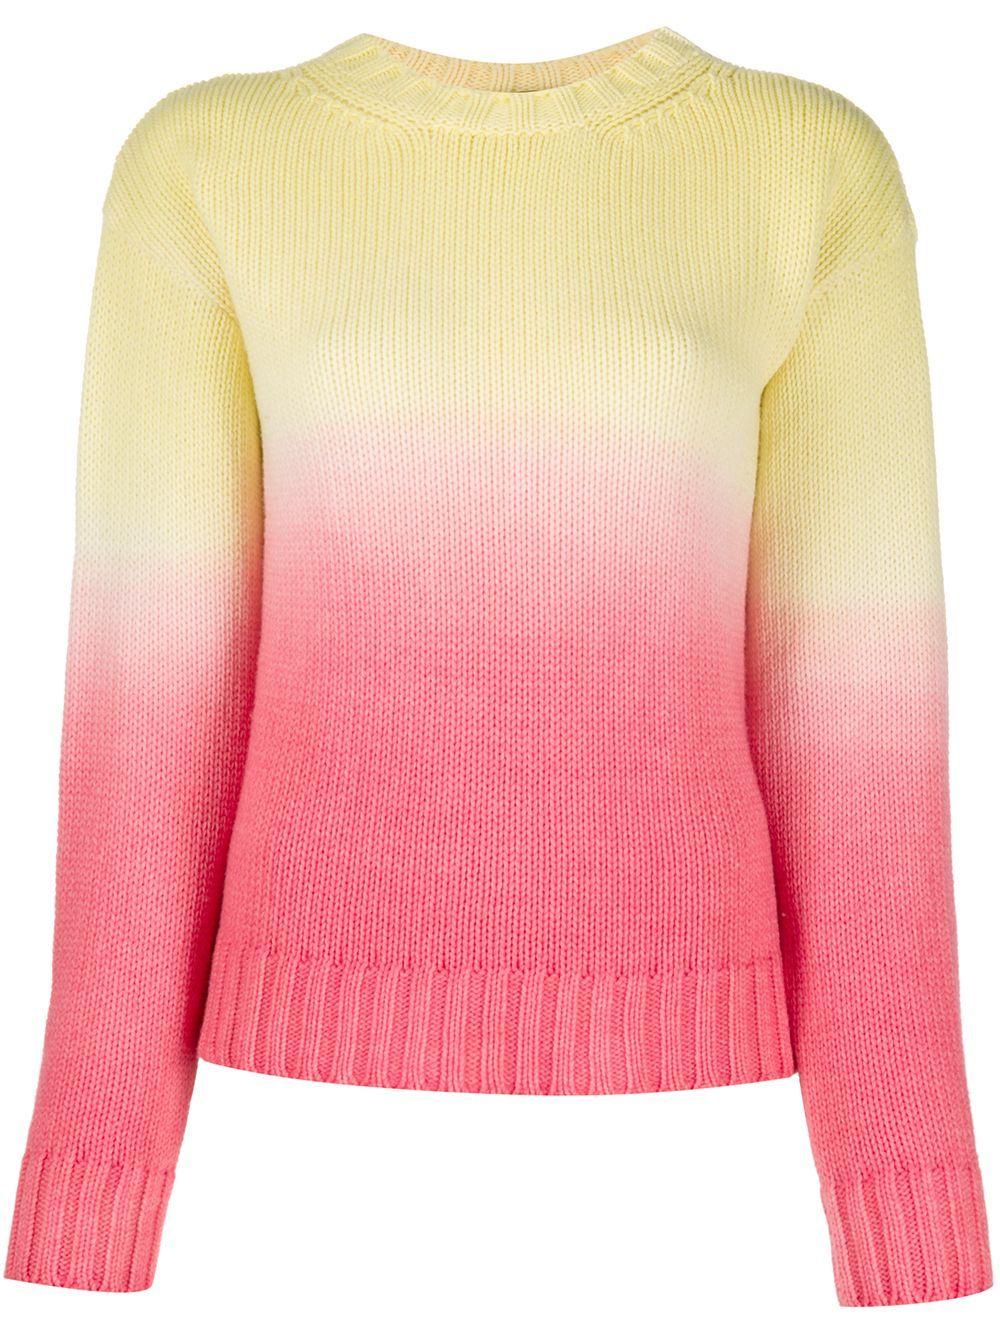 Alanui Wave Life ombré knit jumper - Yellow